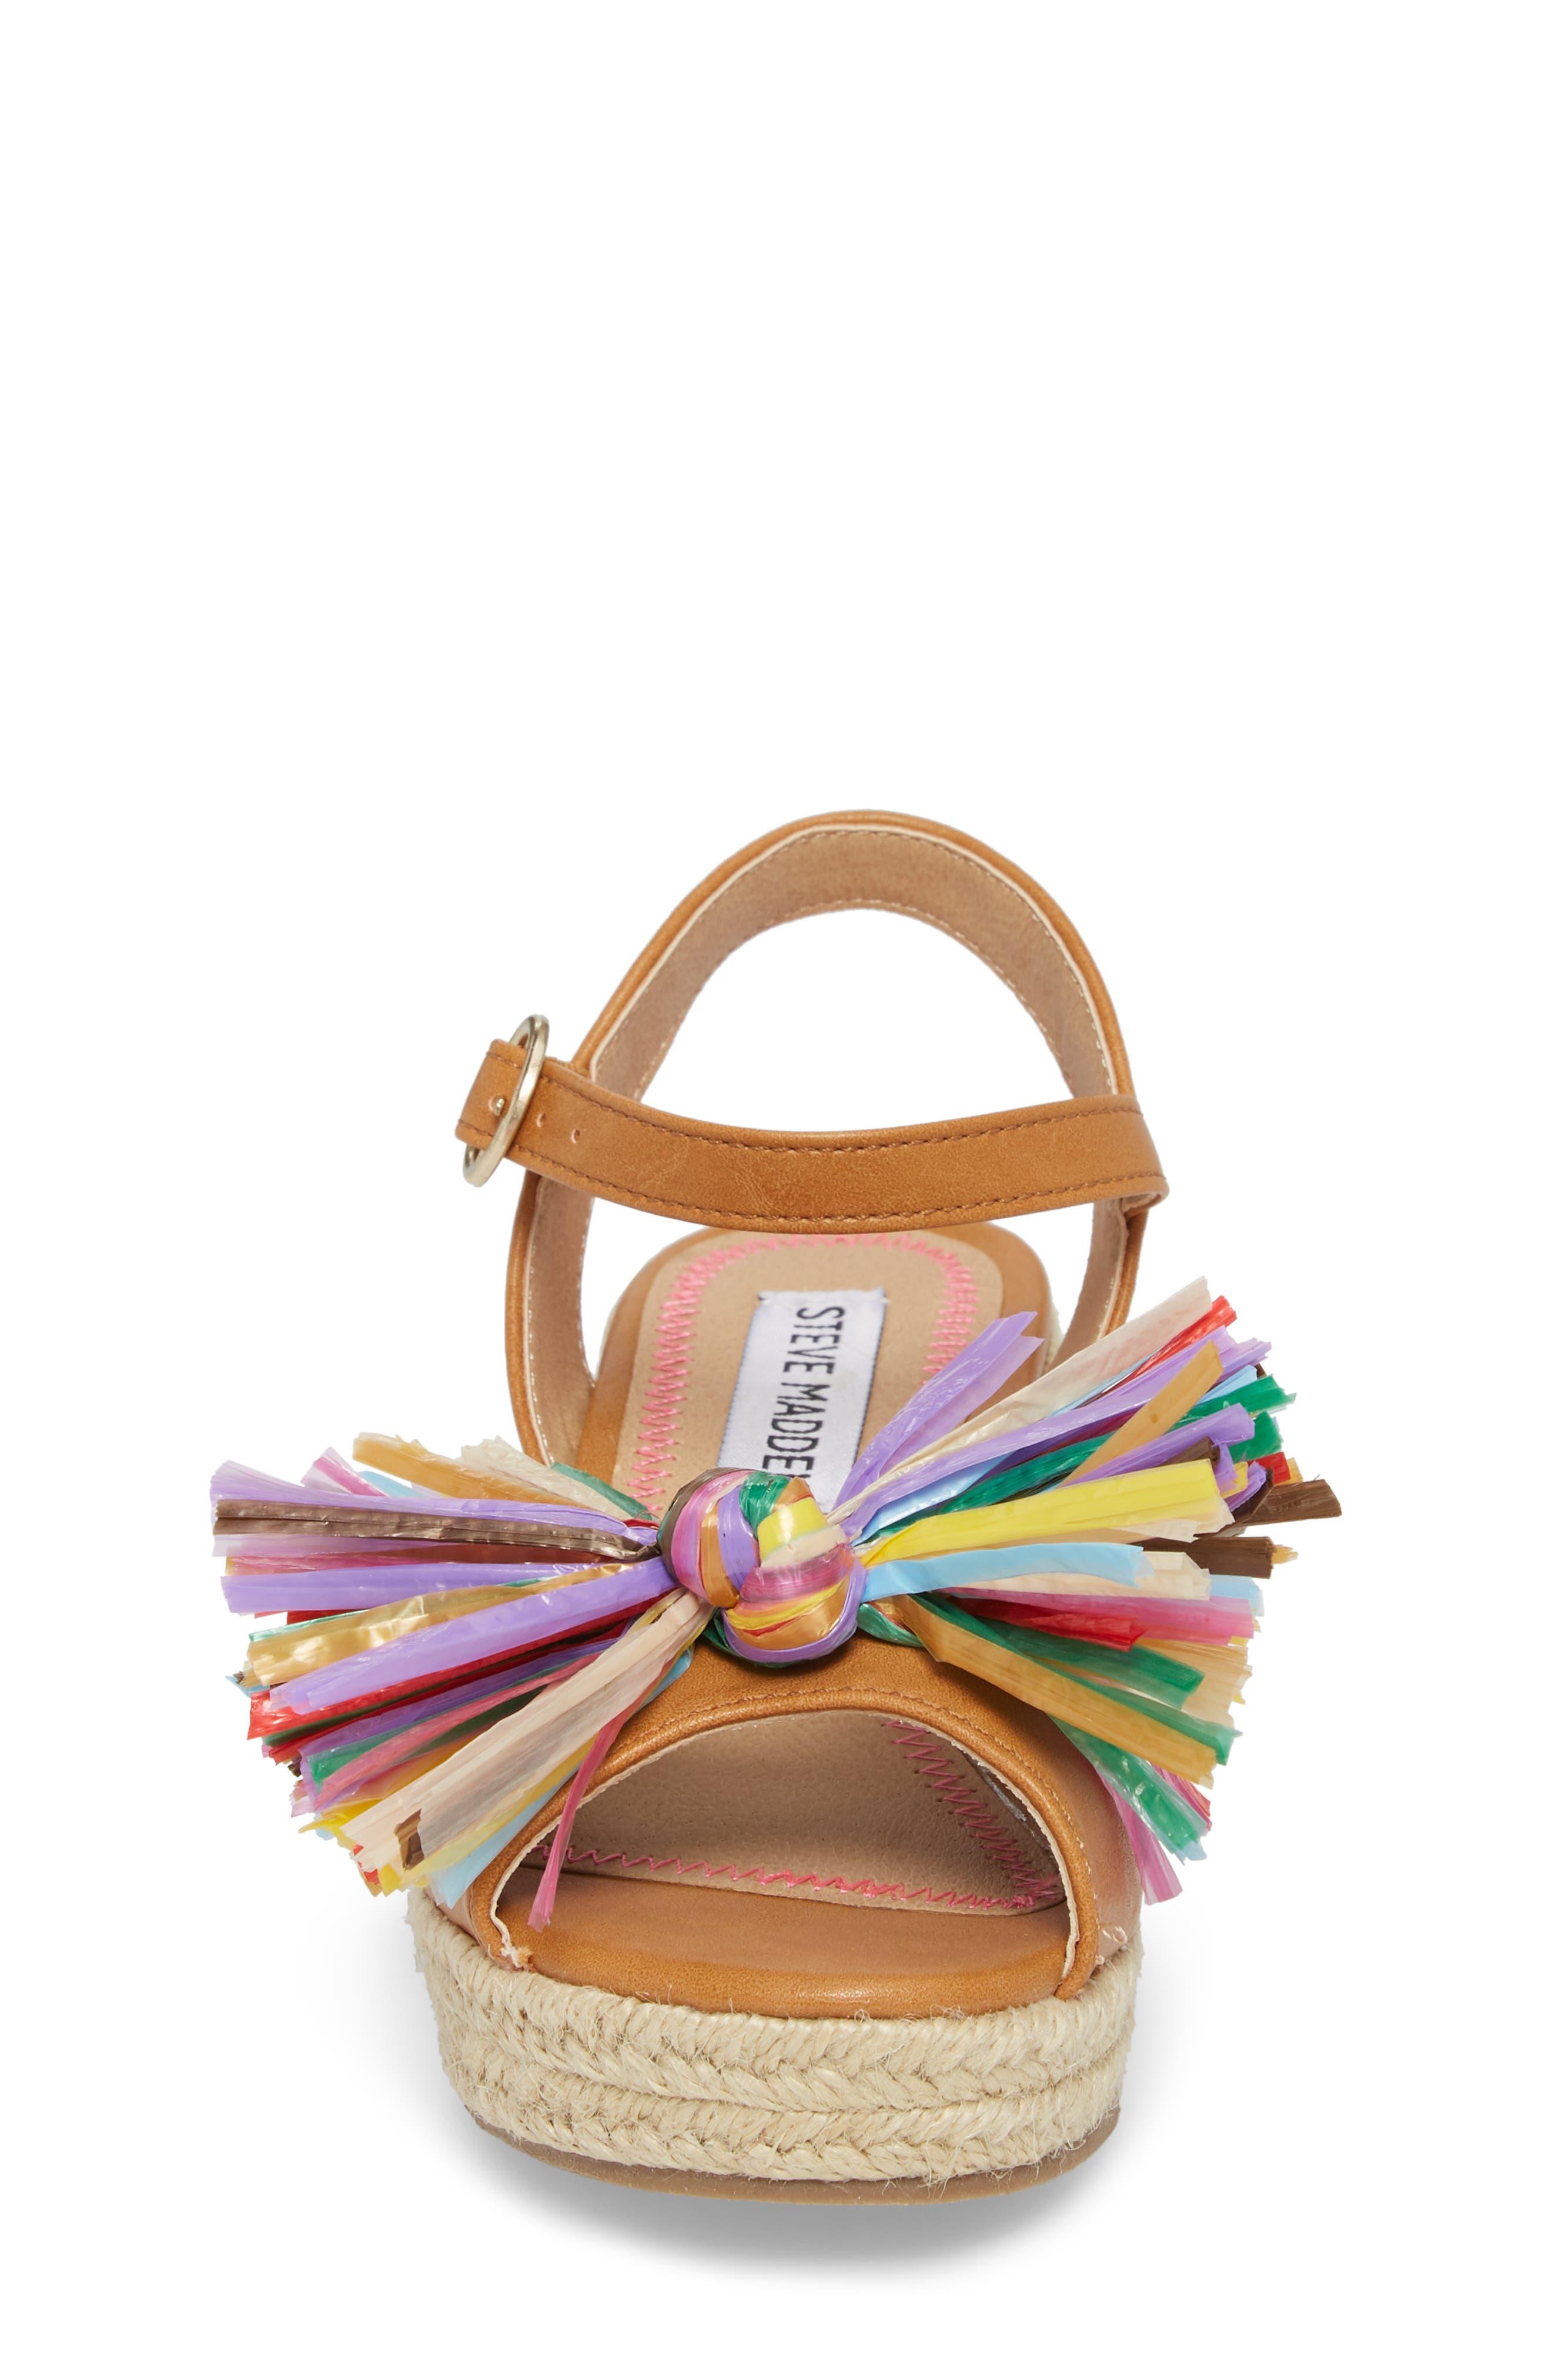 JSTRWBERI Wedge Sandal,                             Alternate thumbnail 4, color,                             Cognac Multi